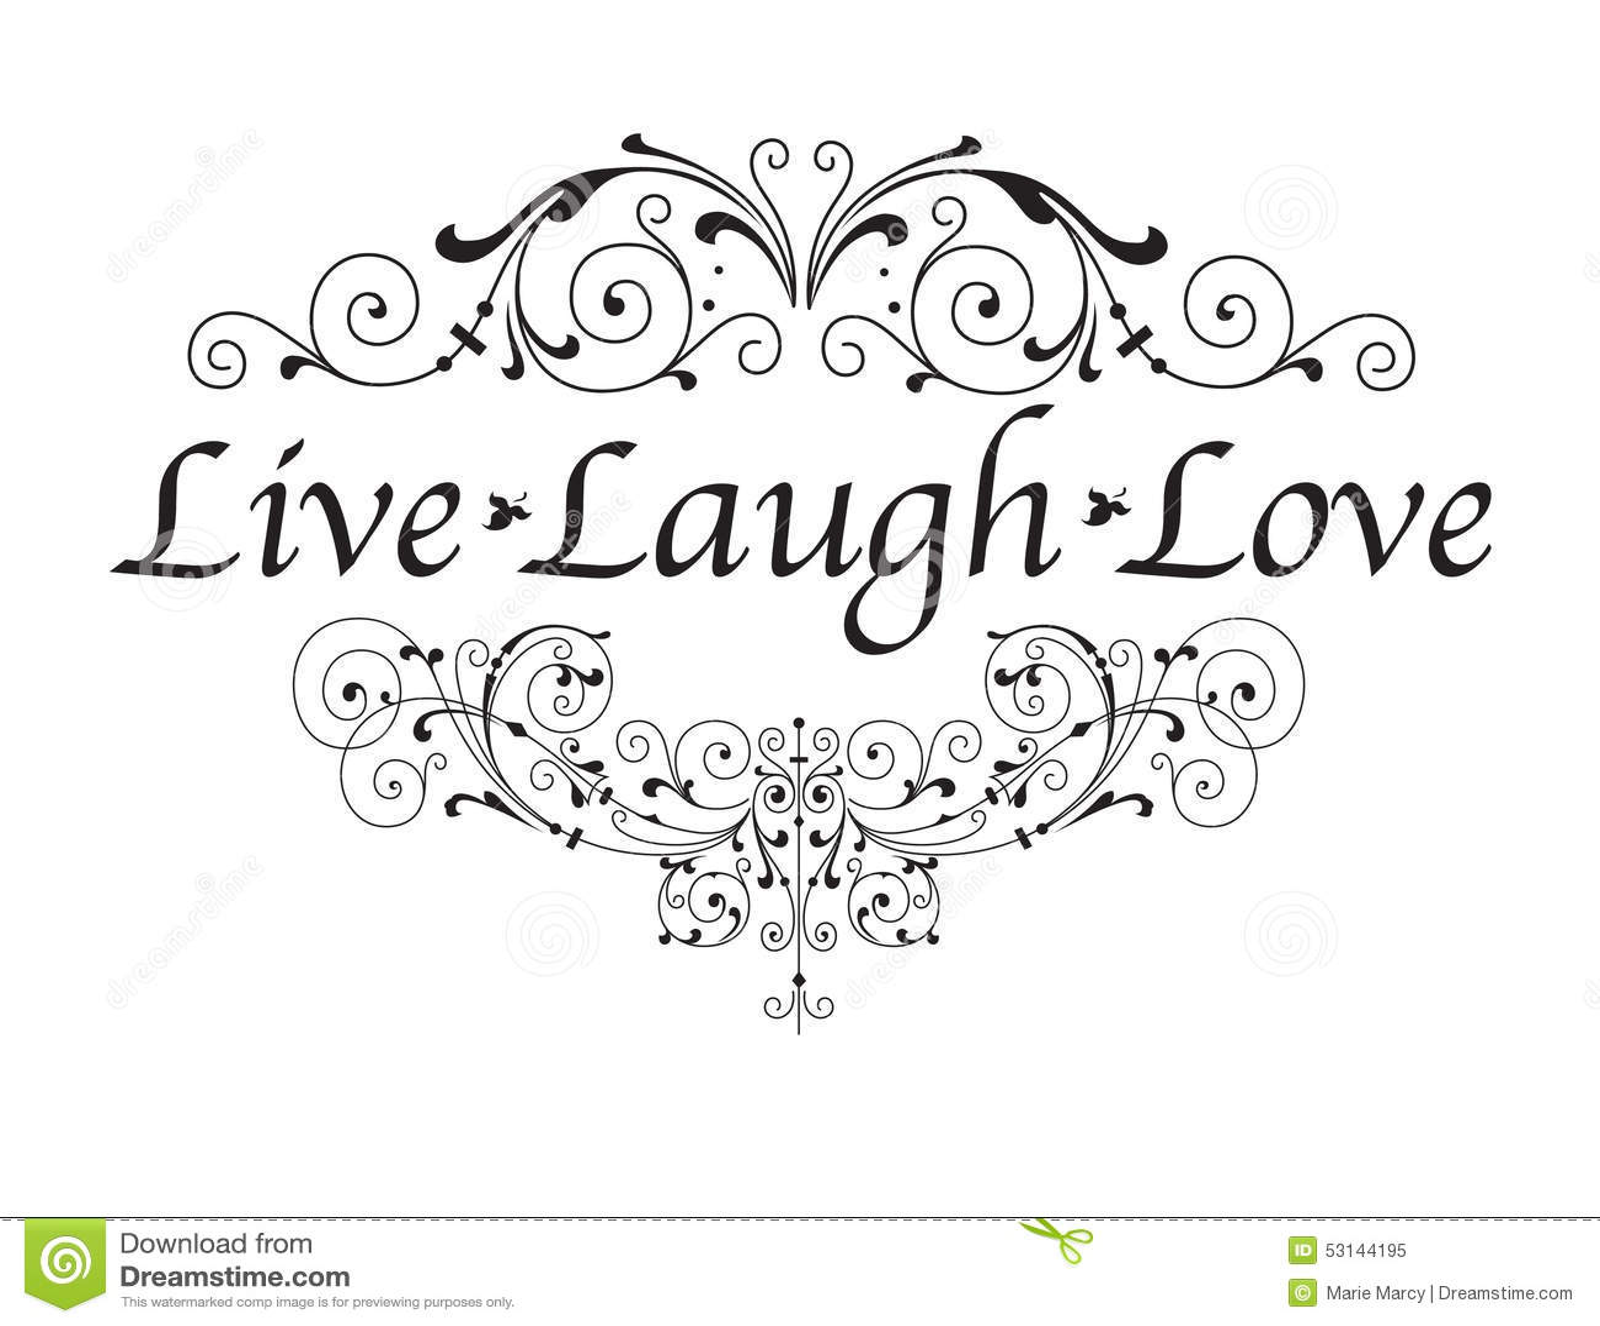 Laugh illustration - photo#23